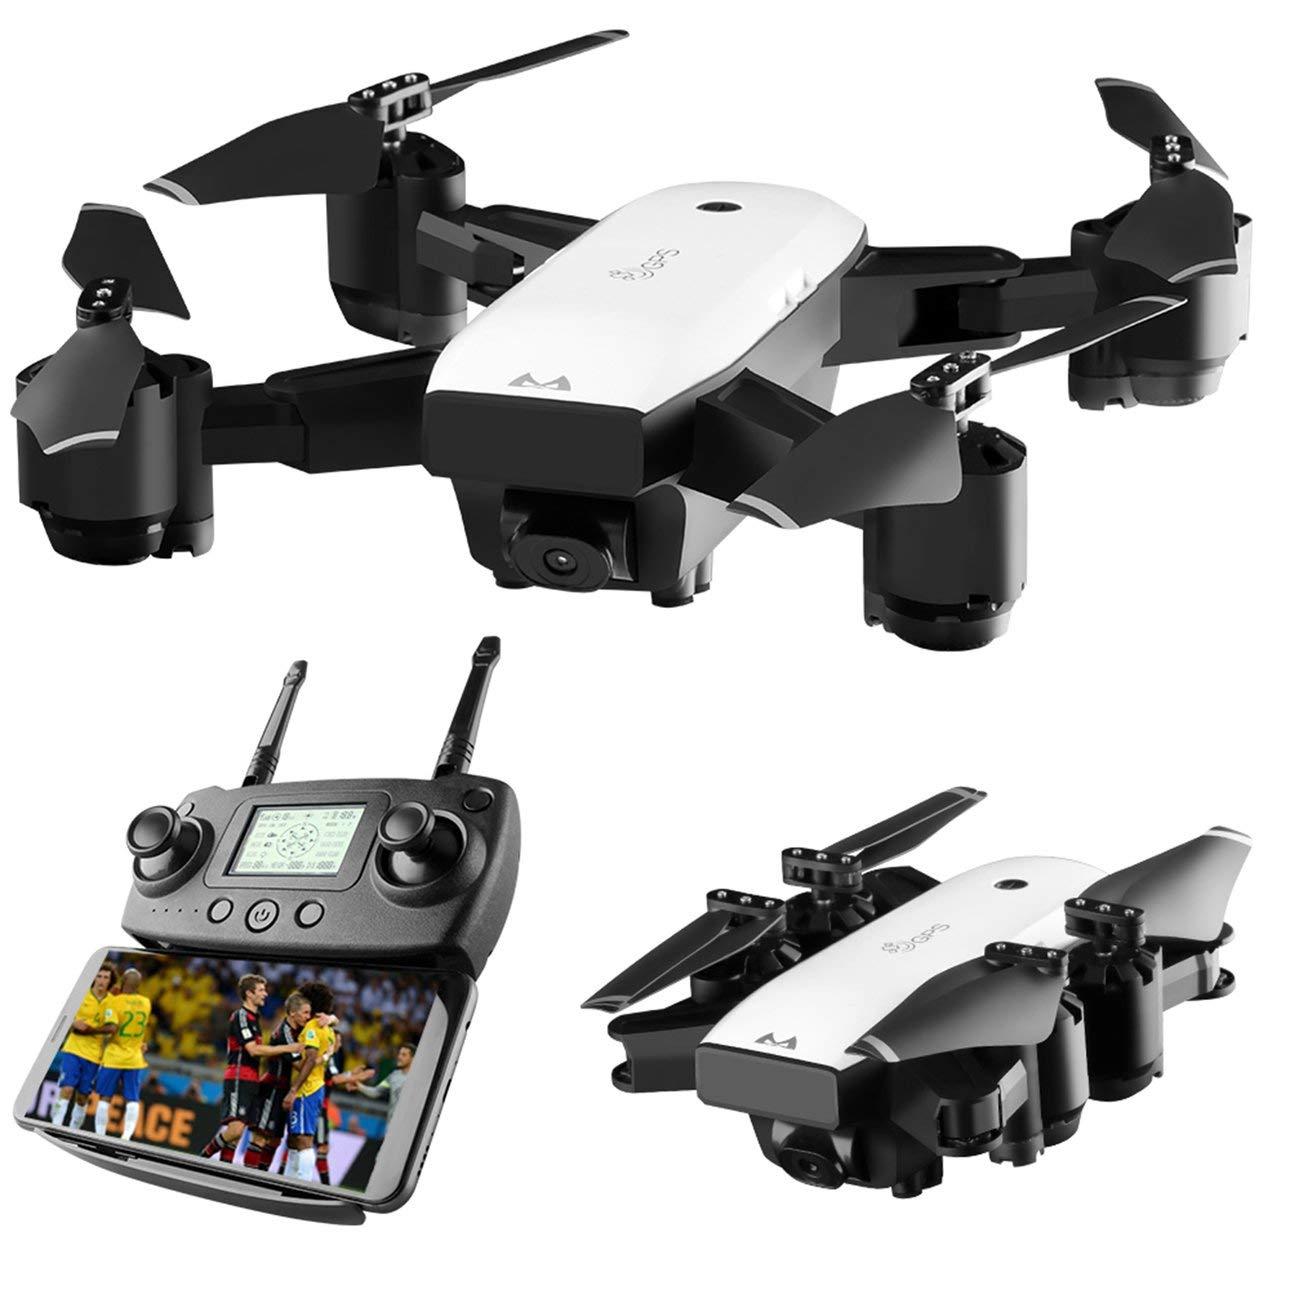 Ballylelly SMRC S20 6 Assi Mini giroscopio GPS Gyro con Telecamera grandangolare da 110 Gradi 2.4G Altitude Hold RC Quadcopter Modello RC Portatile